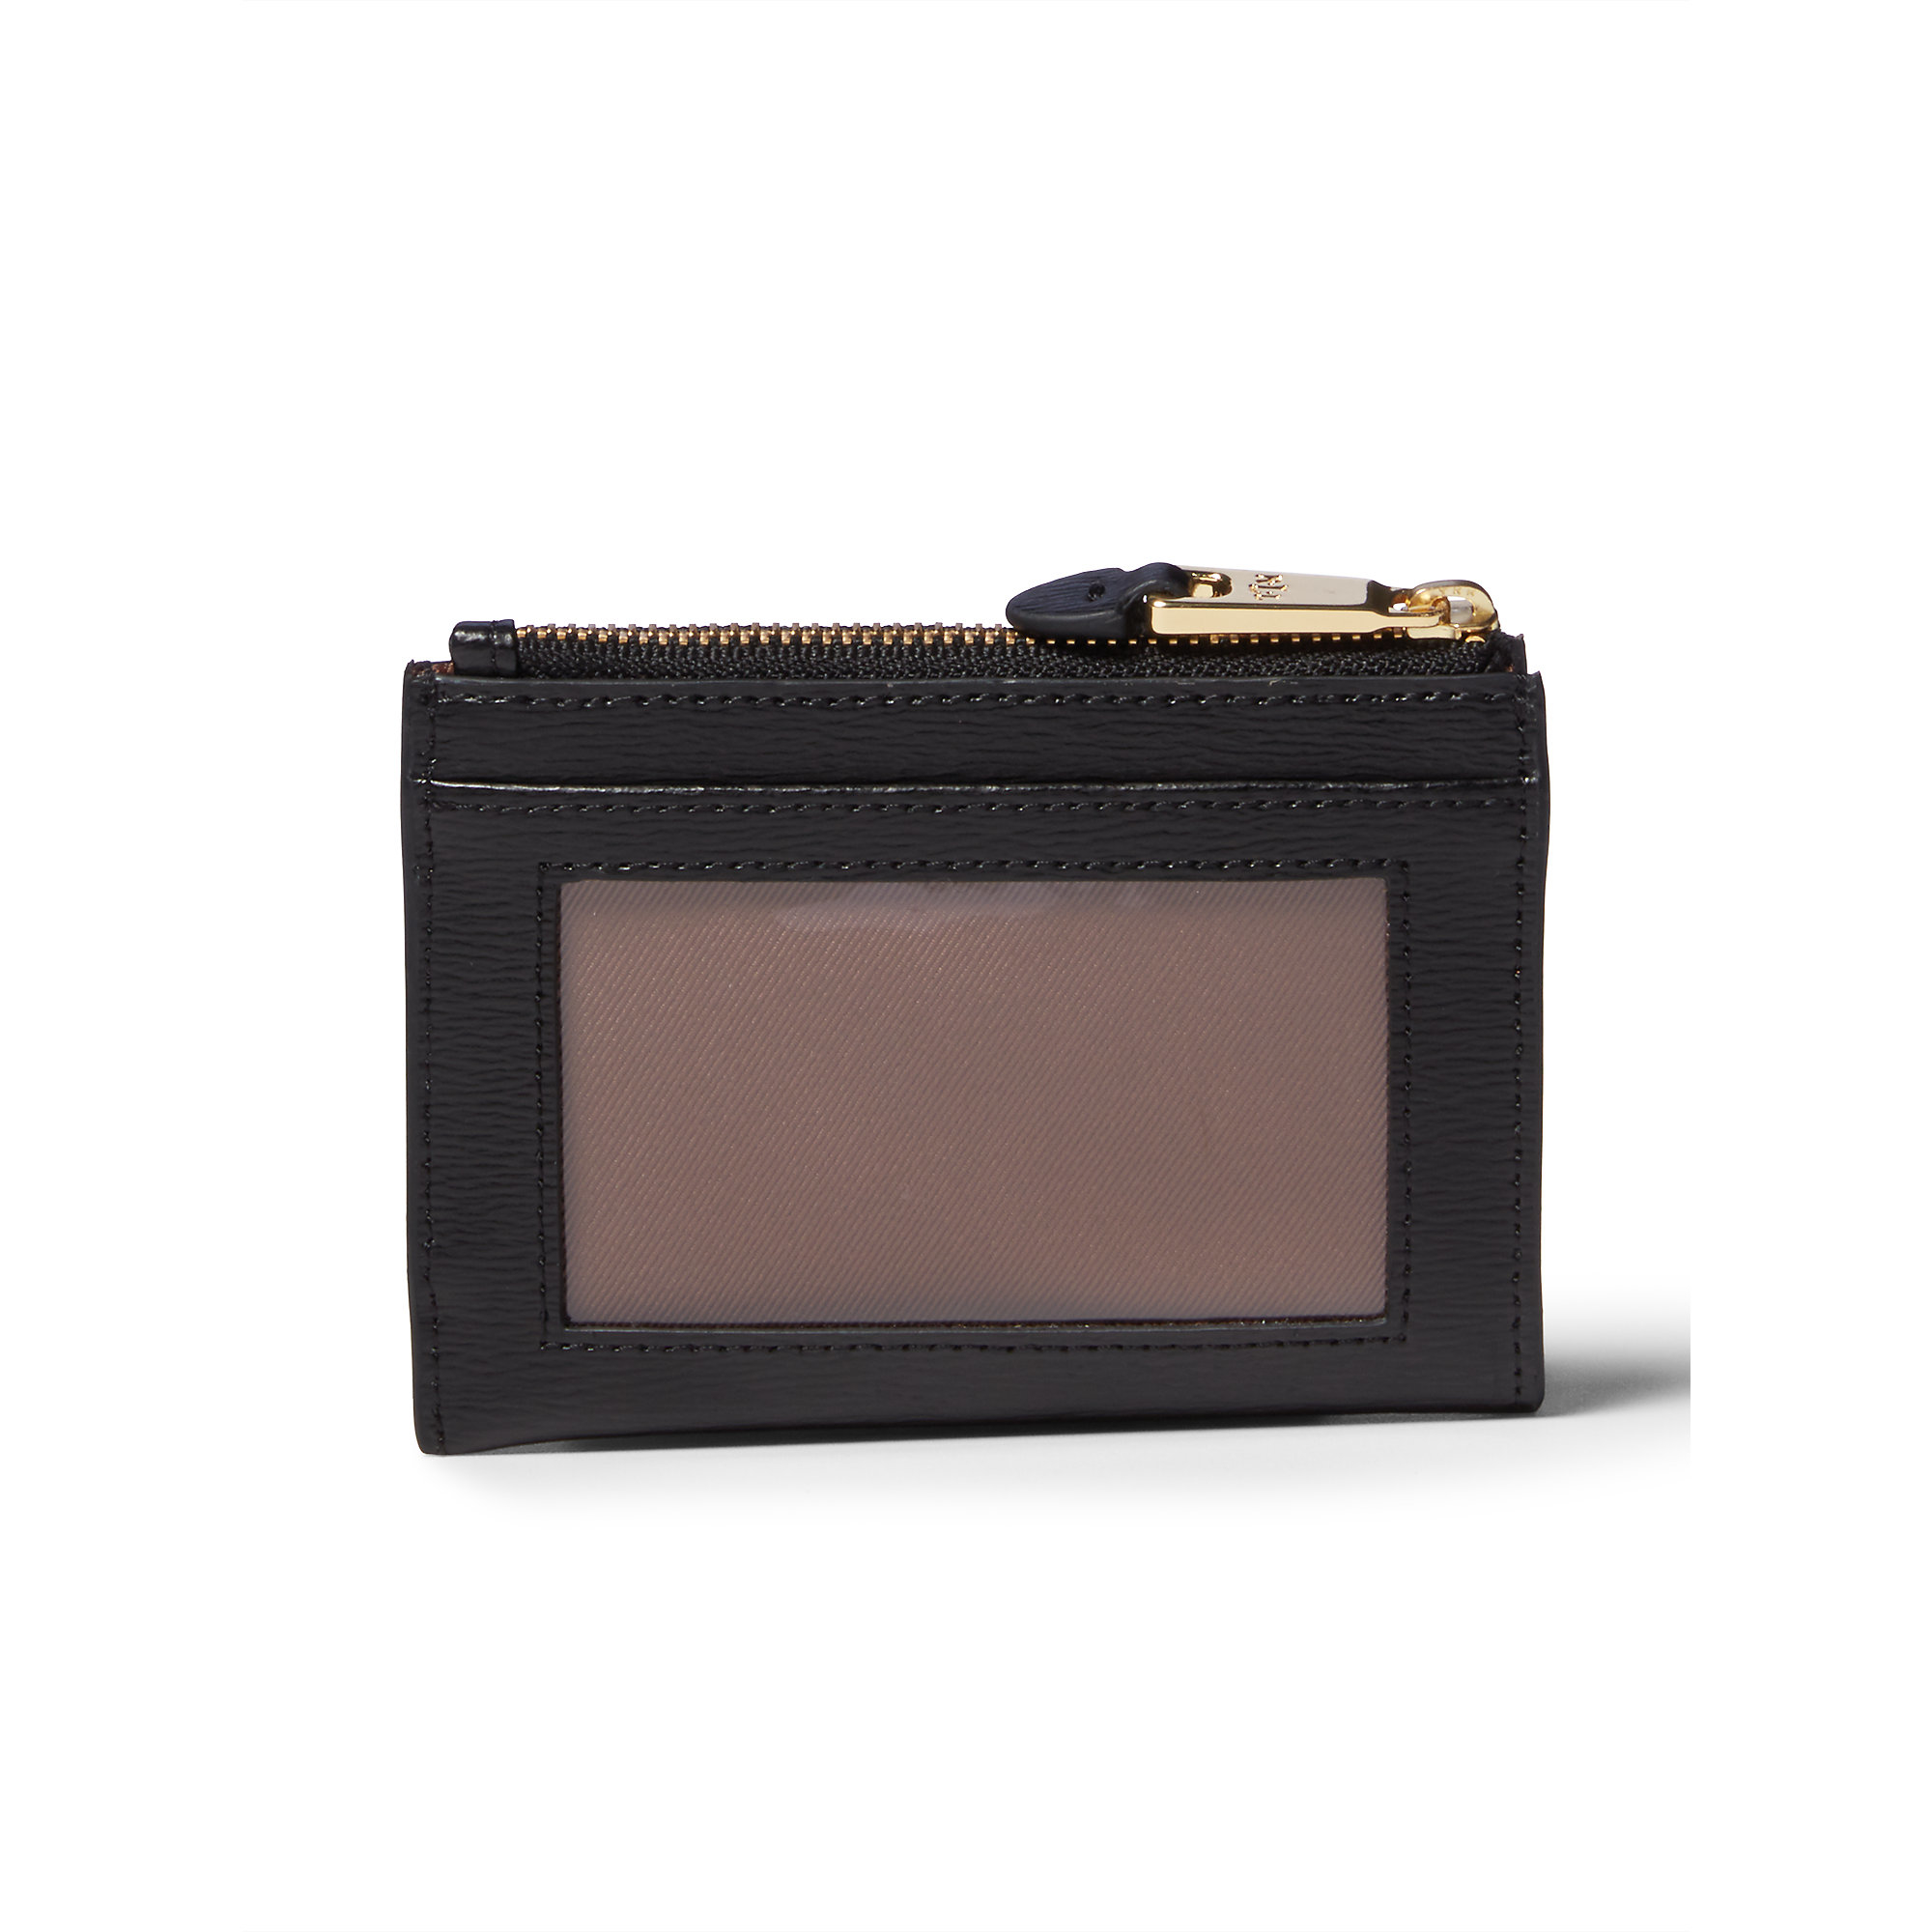 Lyst - Ralph Lauren Newbury Leather Coin Pouch in Black ca400c6db6